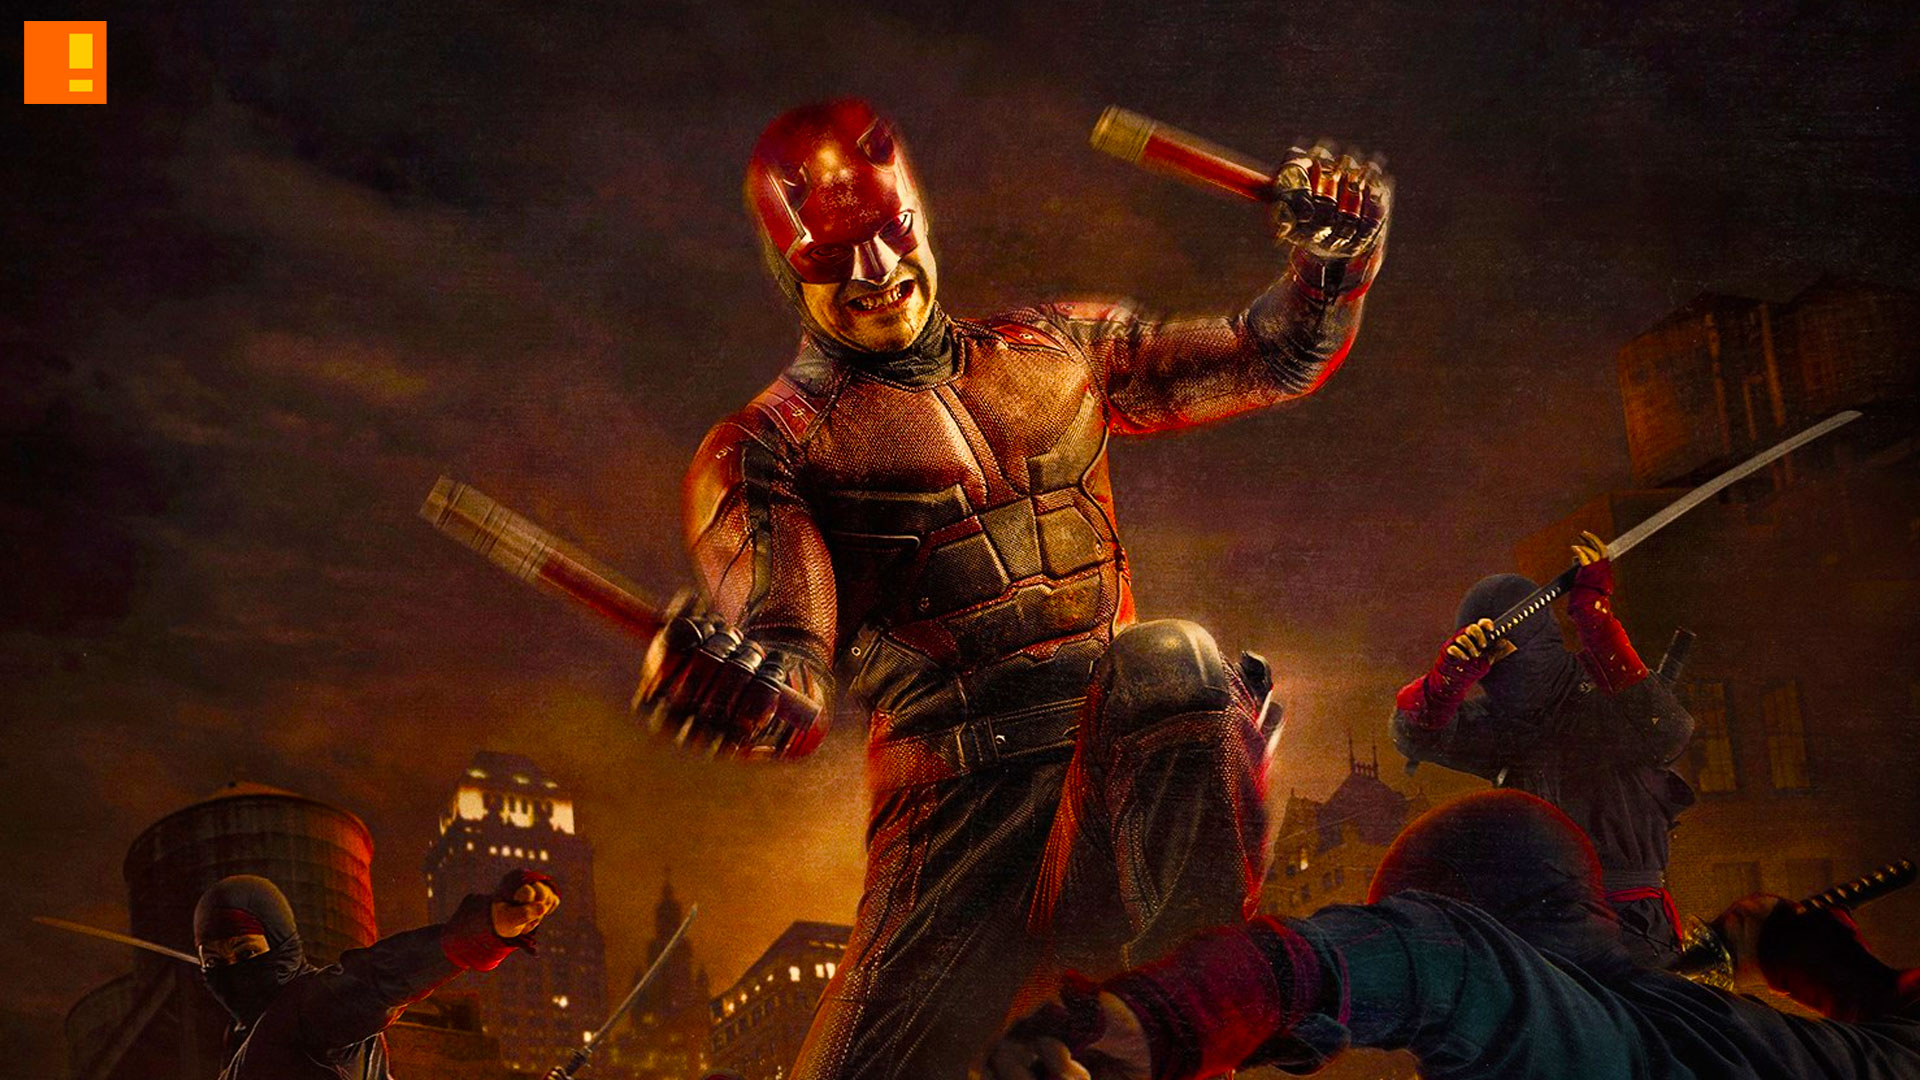 Marvel Netflix premieres Daredevil Season 2 in NYC 1920x1080